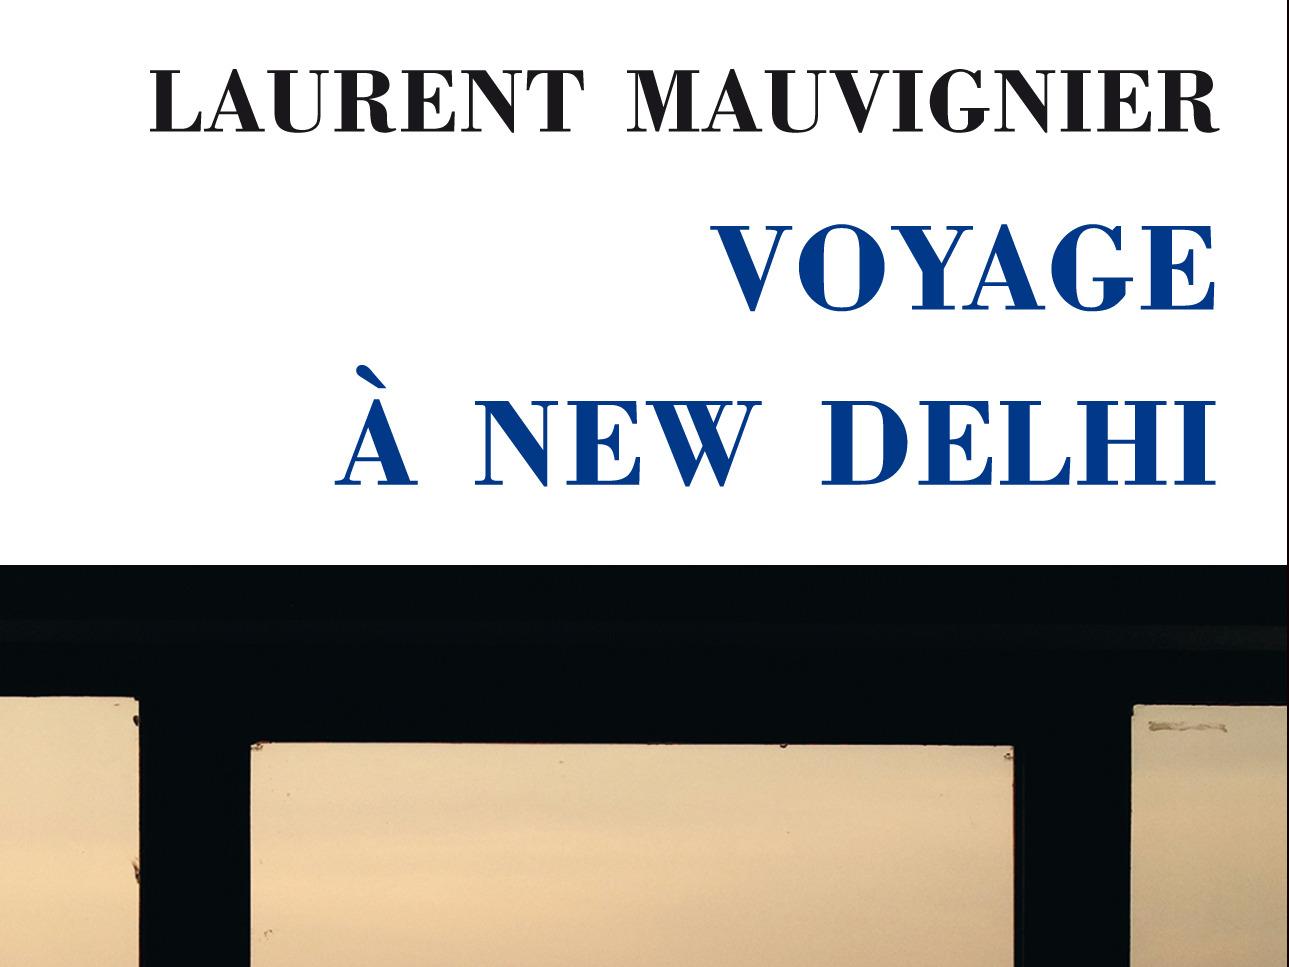 Voyage a New Delhi.jpg